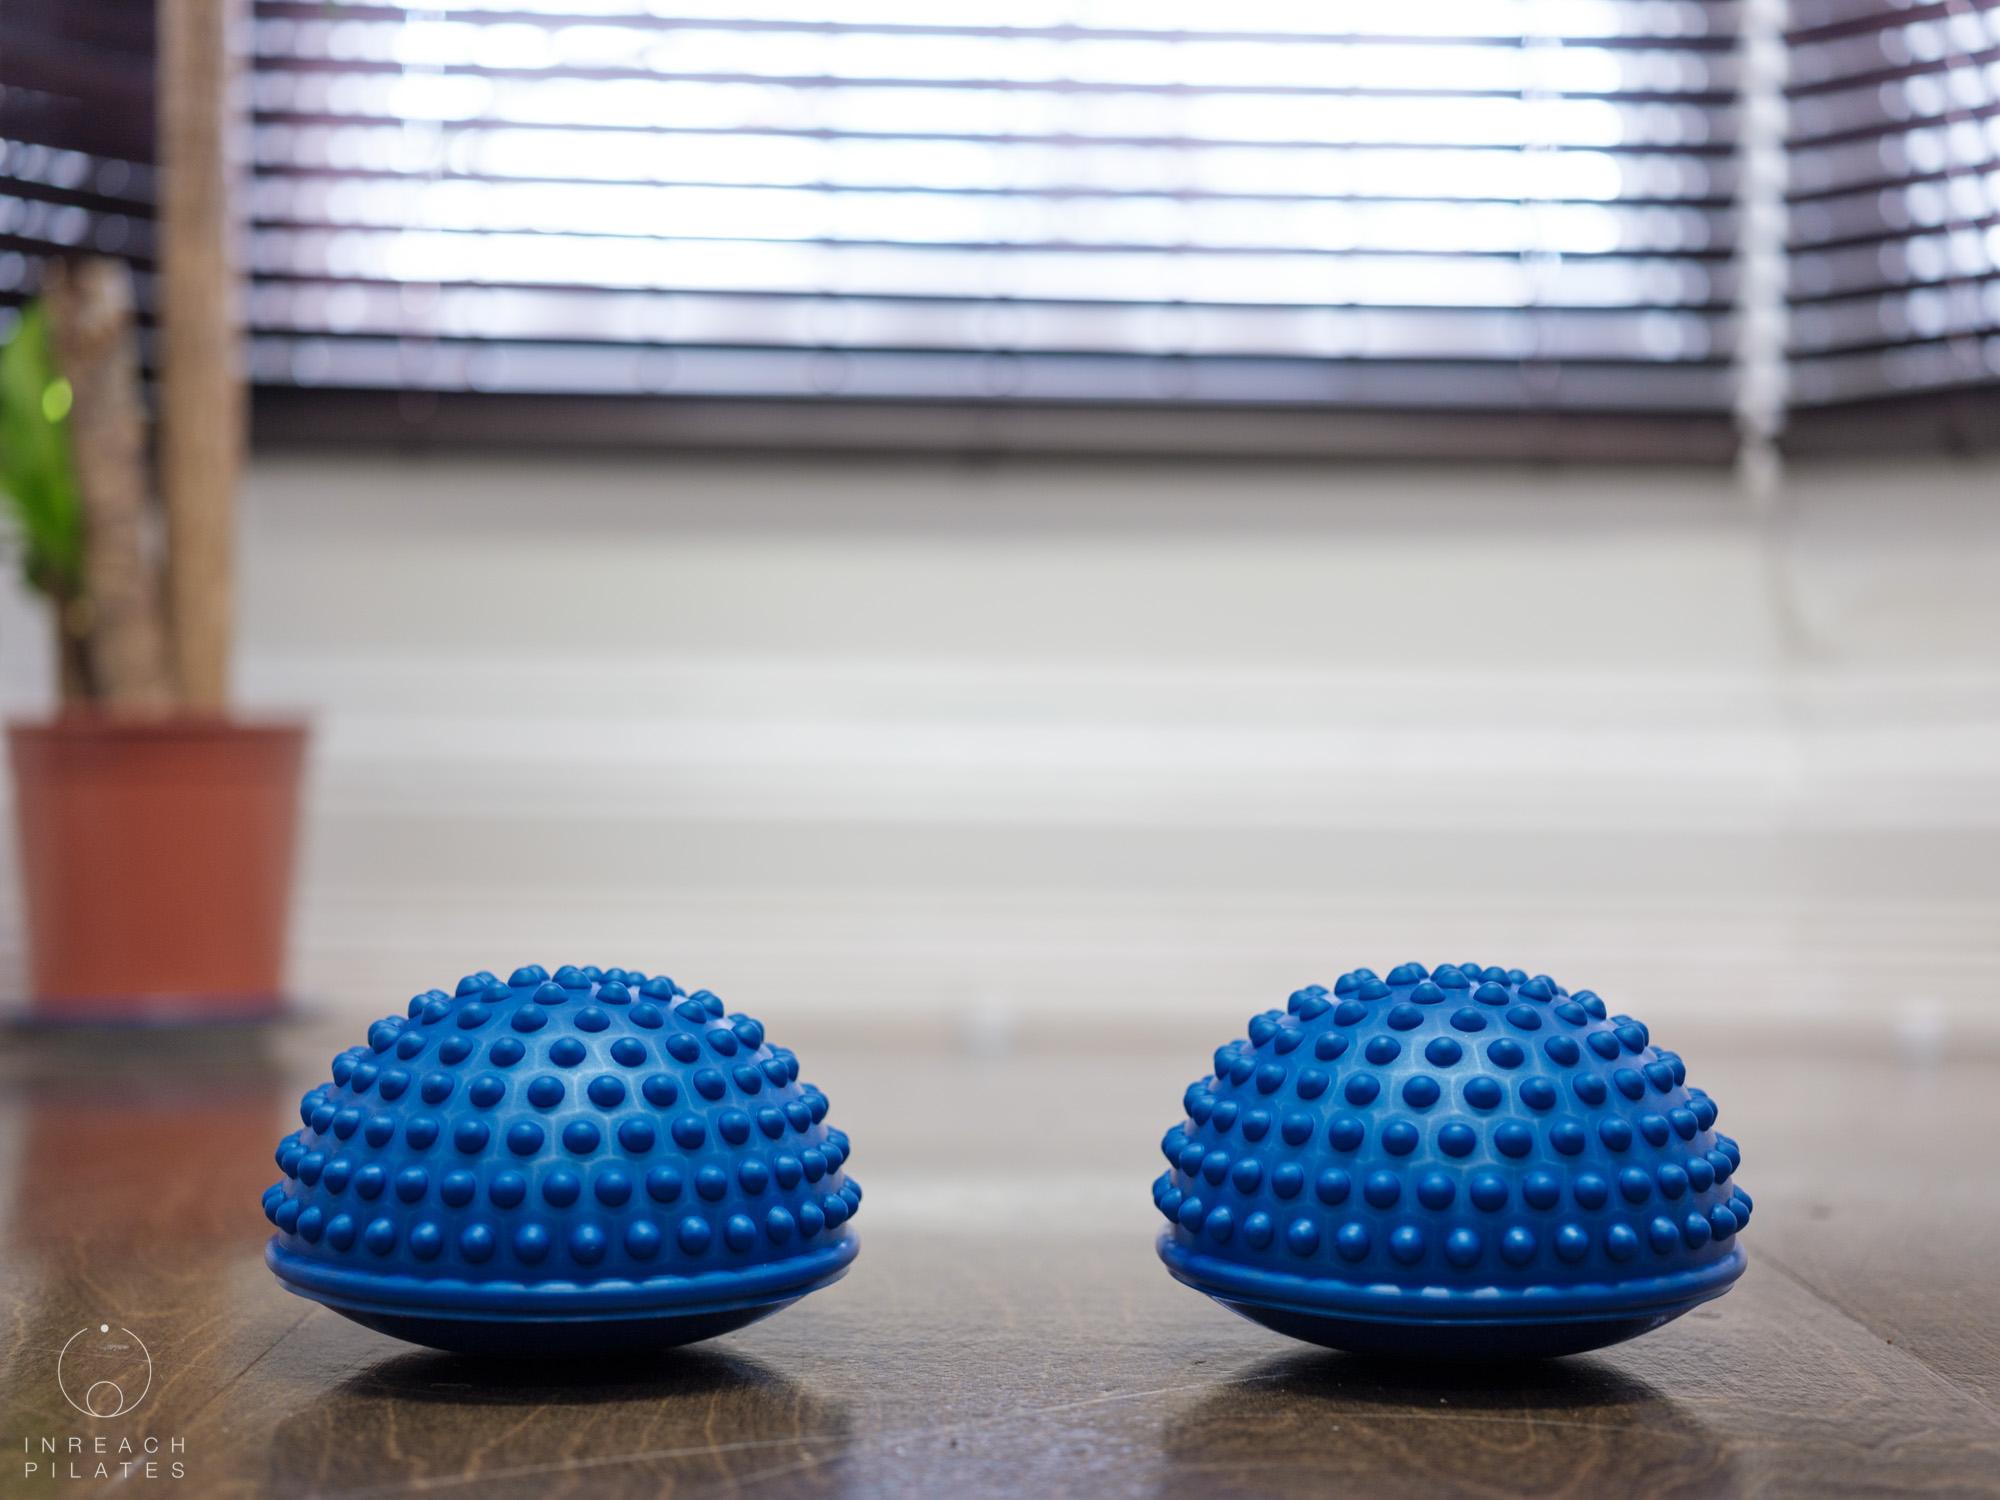 sheffield pilates studio - equipment - balance pods